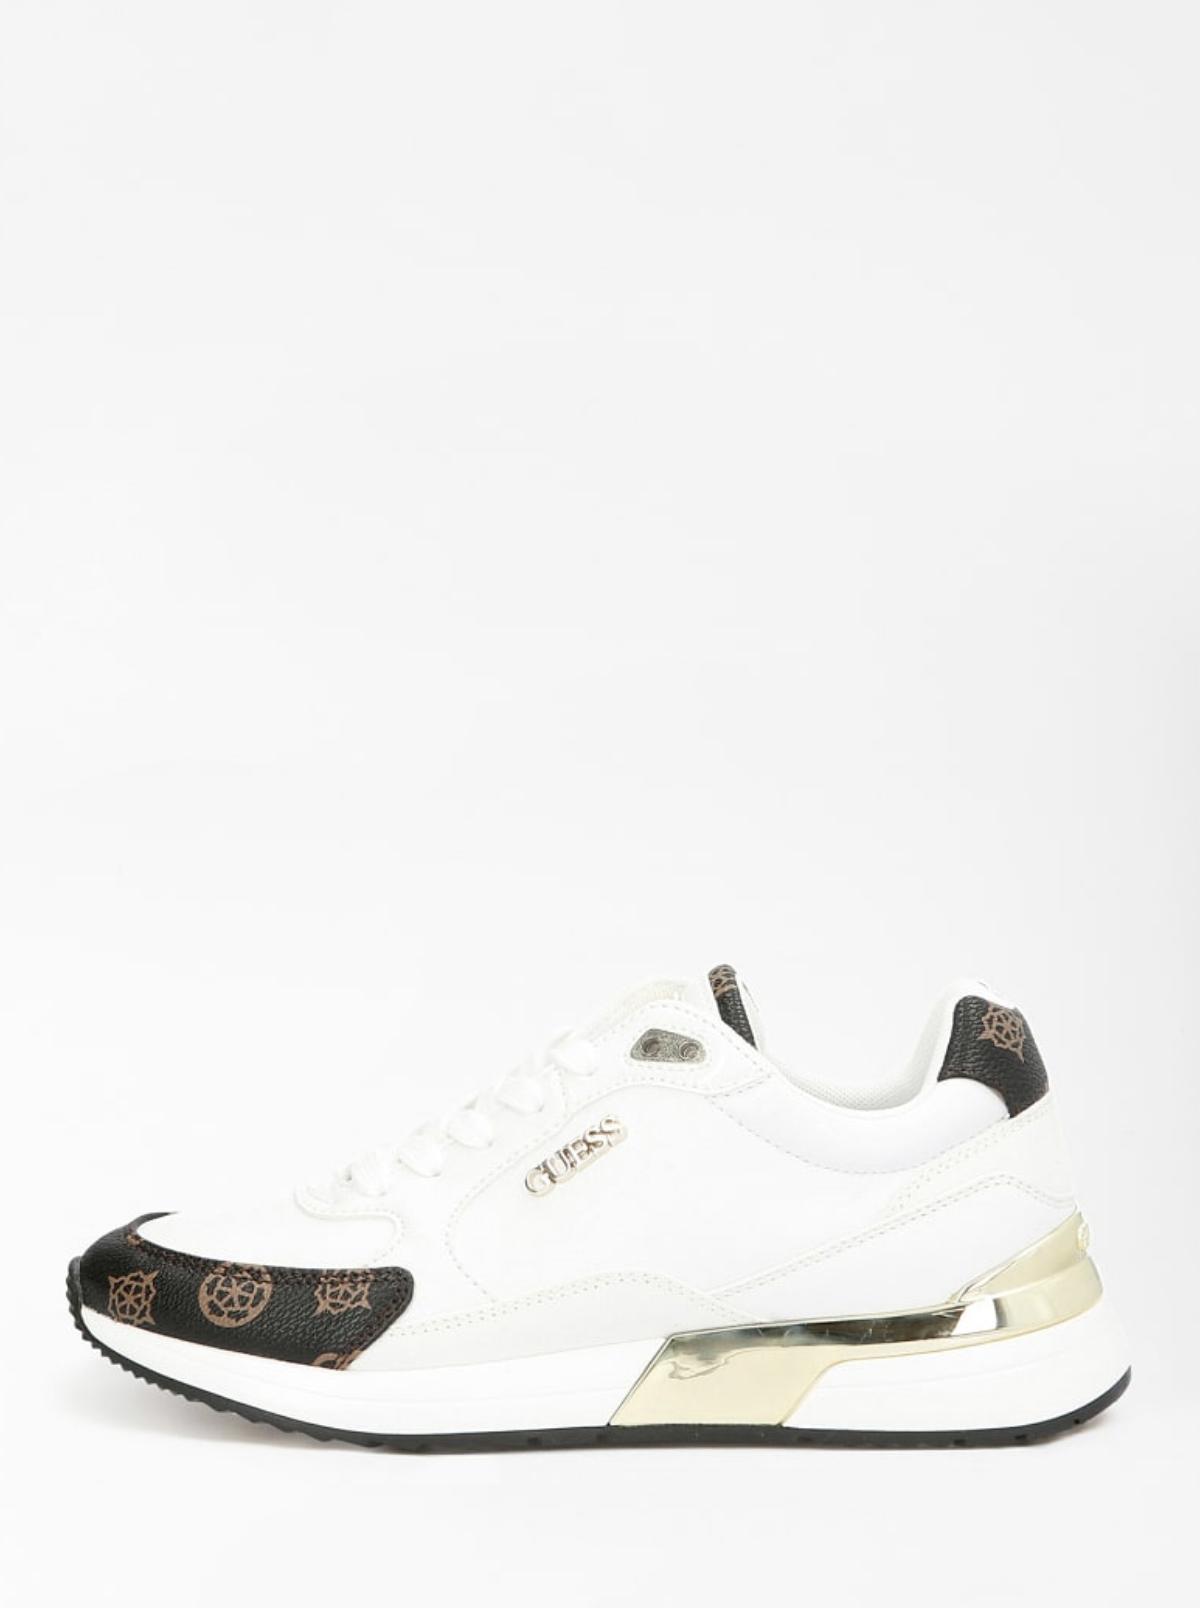 Guess sneaker 👟 New 2021 model